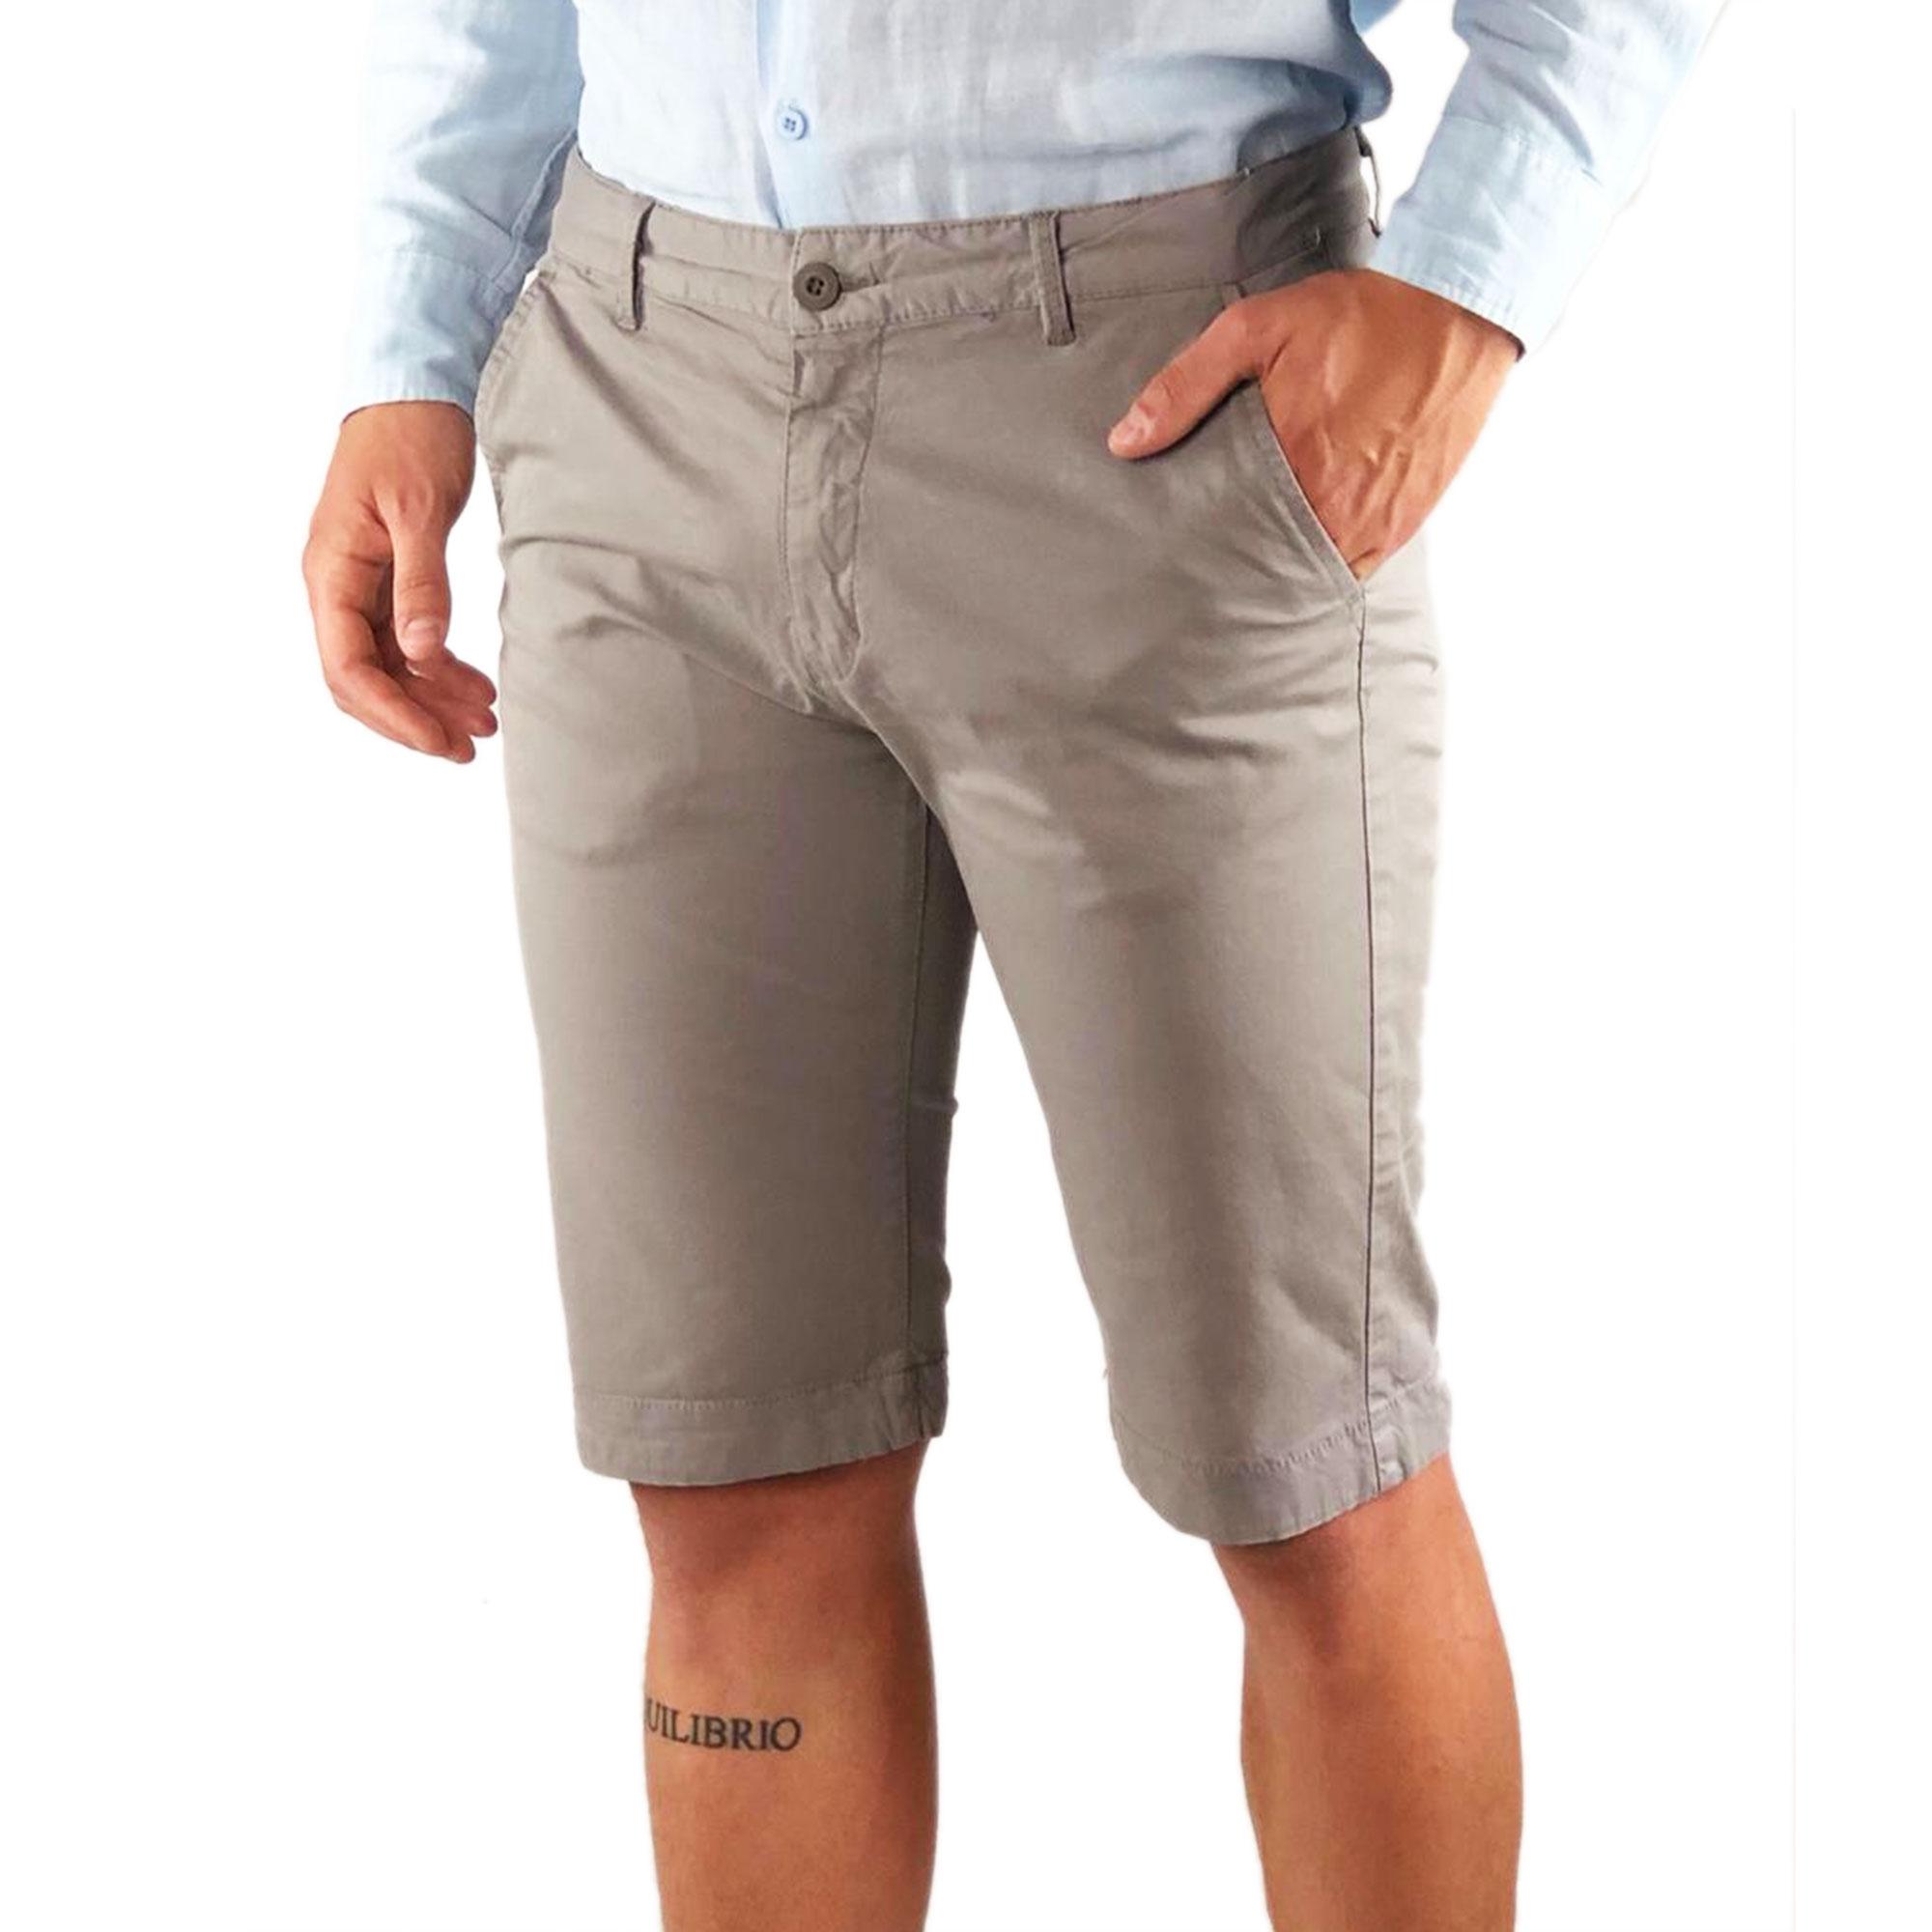 Bermuda-Uomo-Cotone-Slim-Fit-Jeans-Pantalone-Corto-Shorts-Pantaloncini-Casual miniatura 4